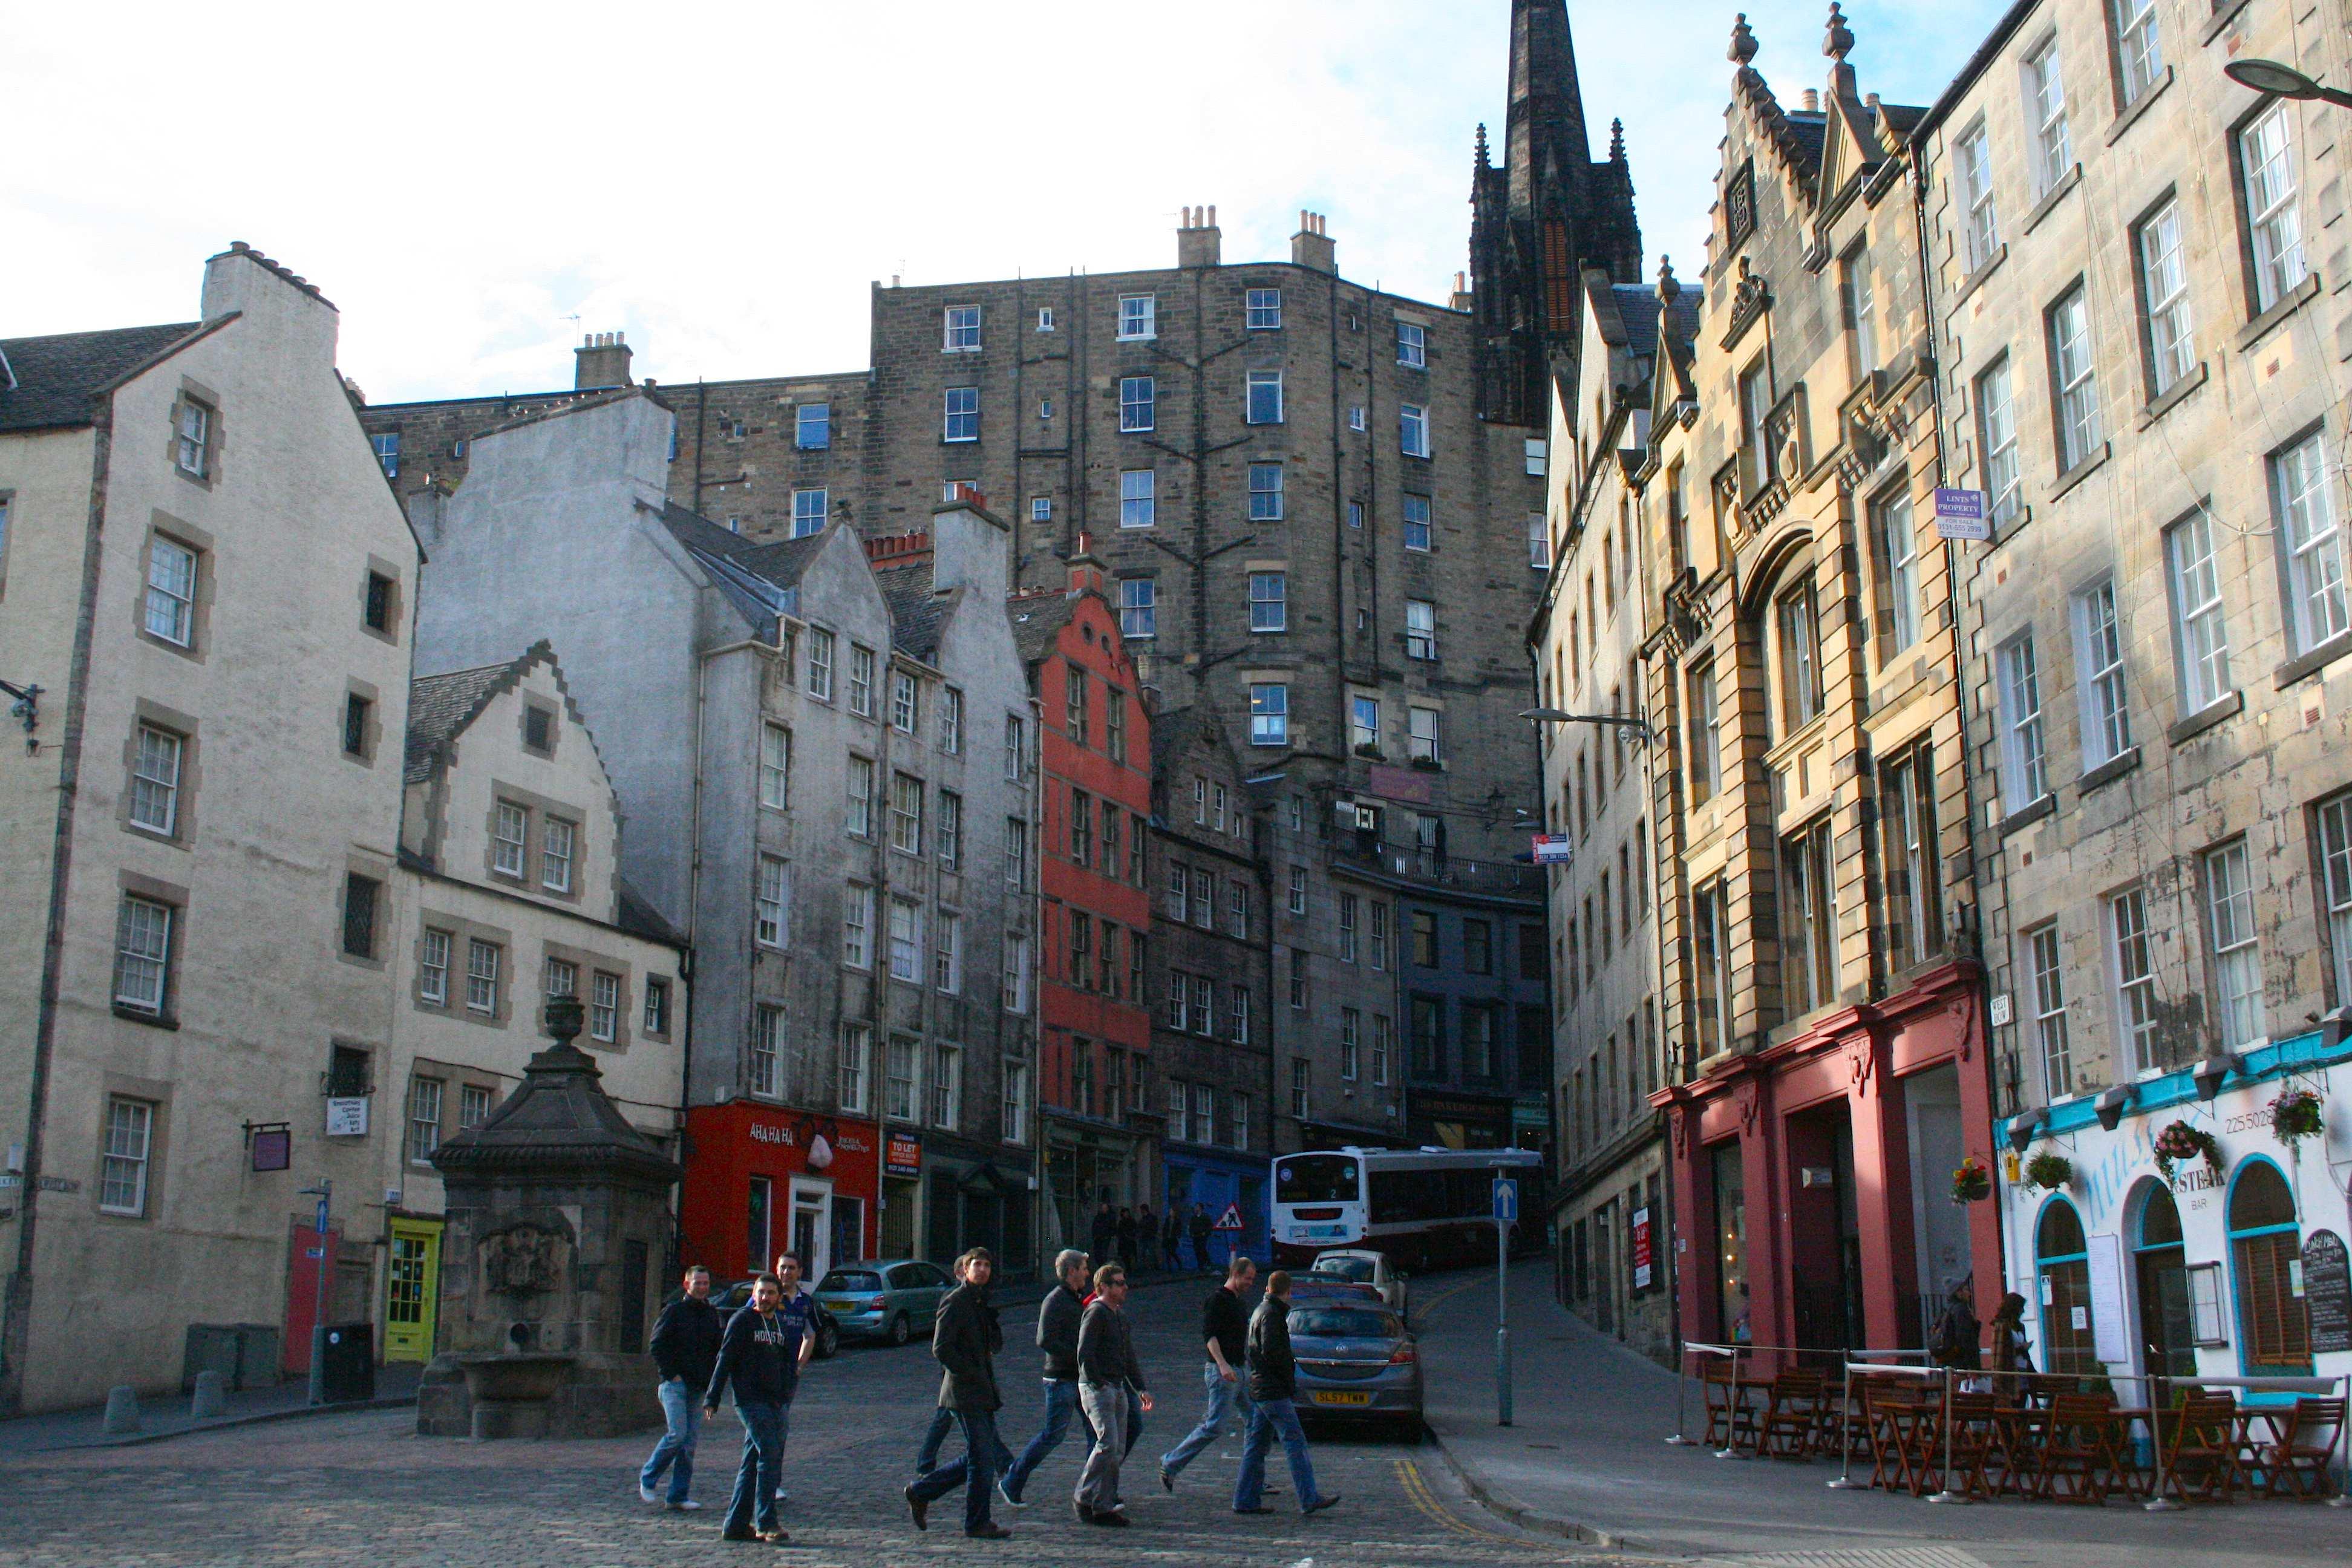 Cheap Grass Market Edinburgh Scotland U Photo A Day Travel Photography Photos With City Street Wallpaper